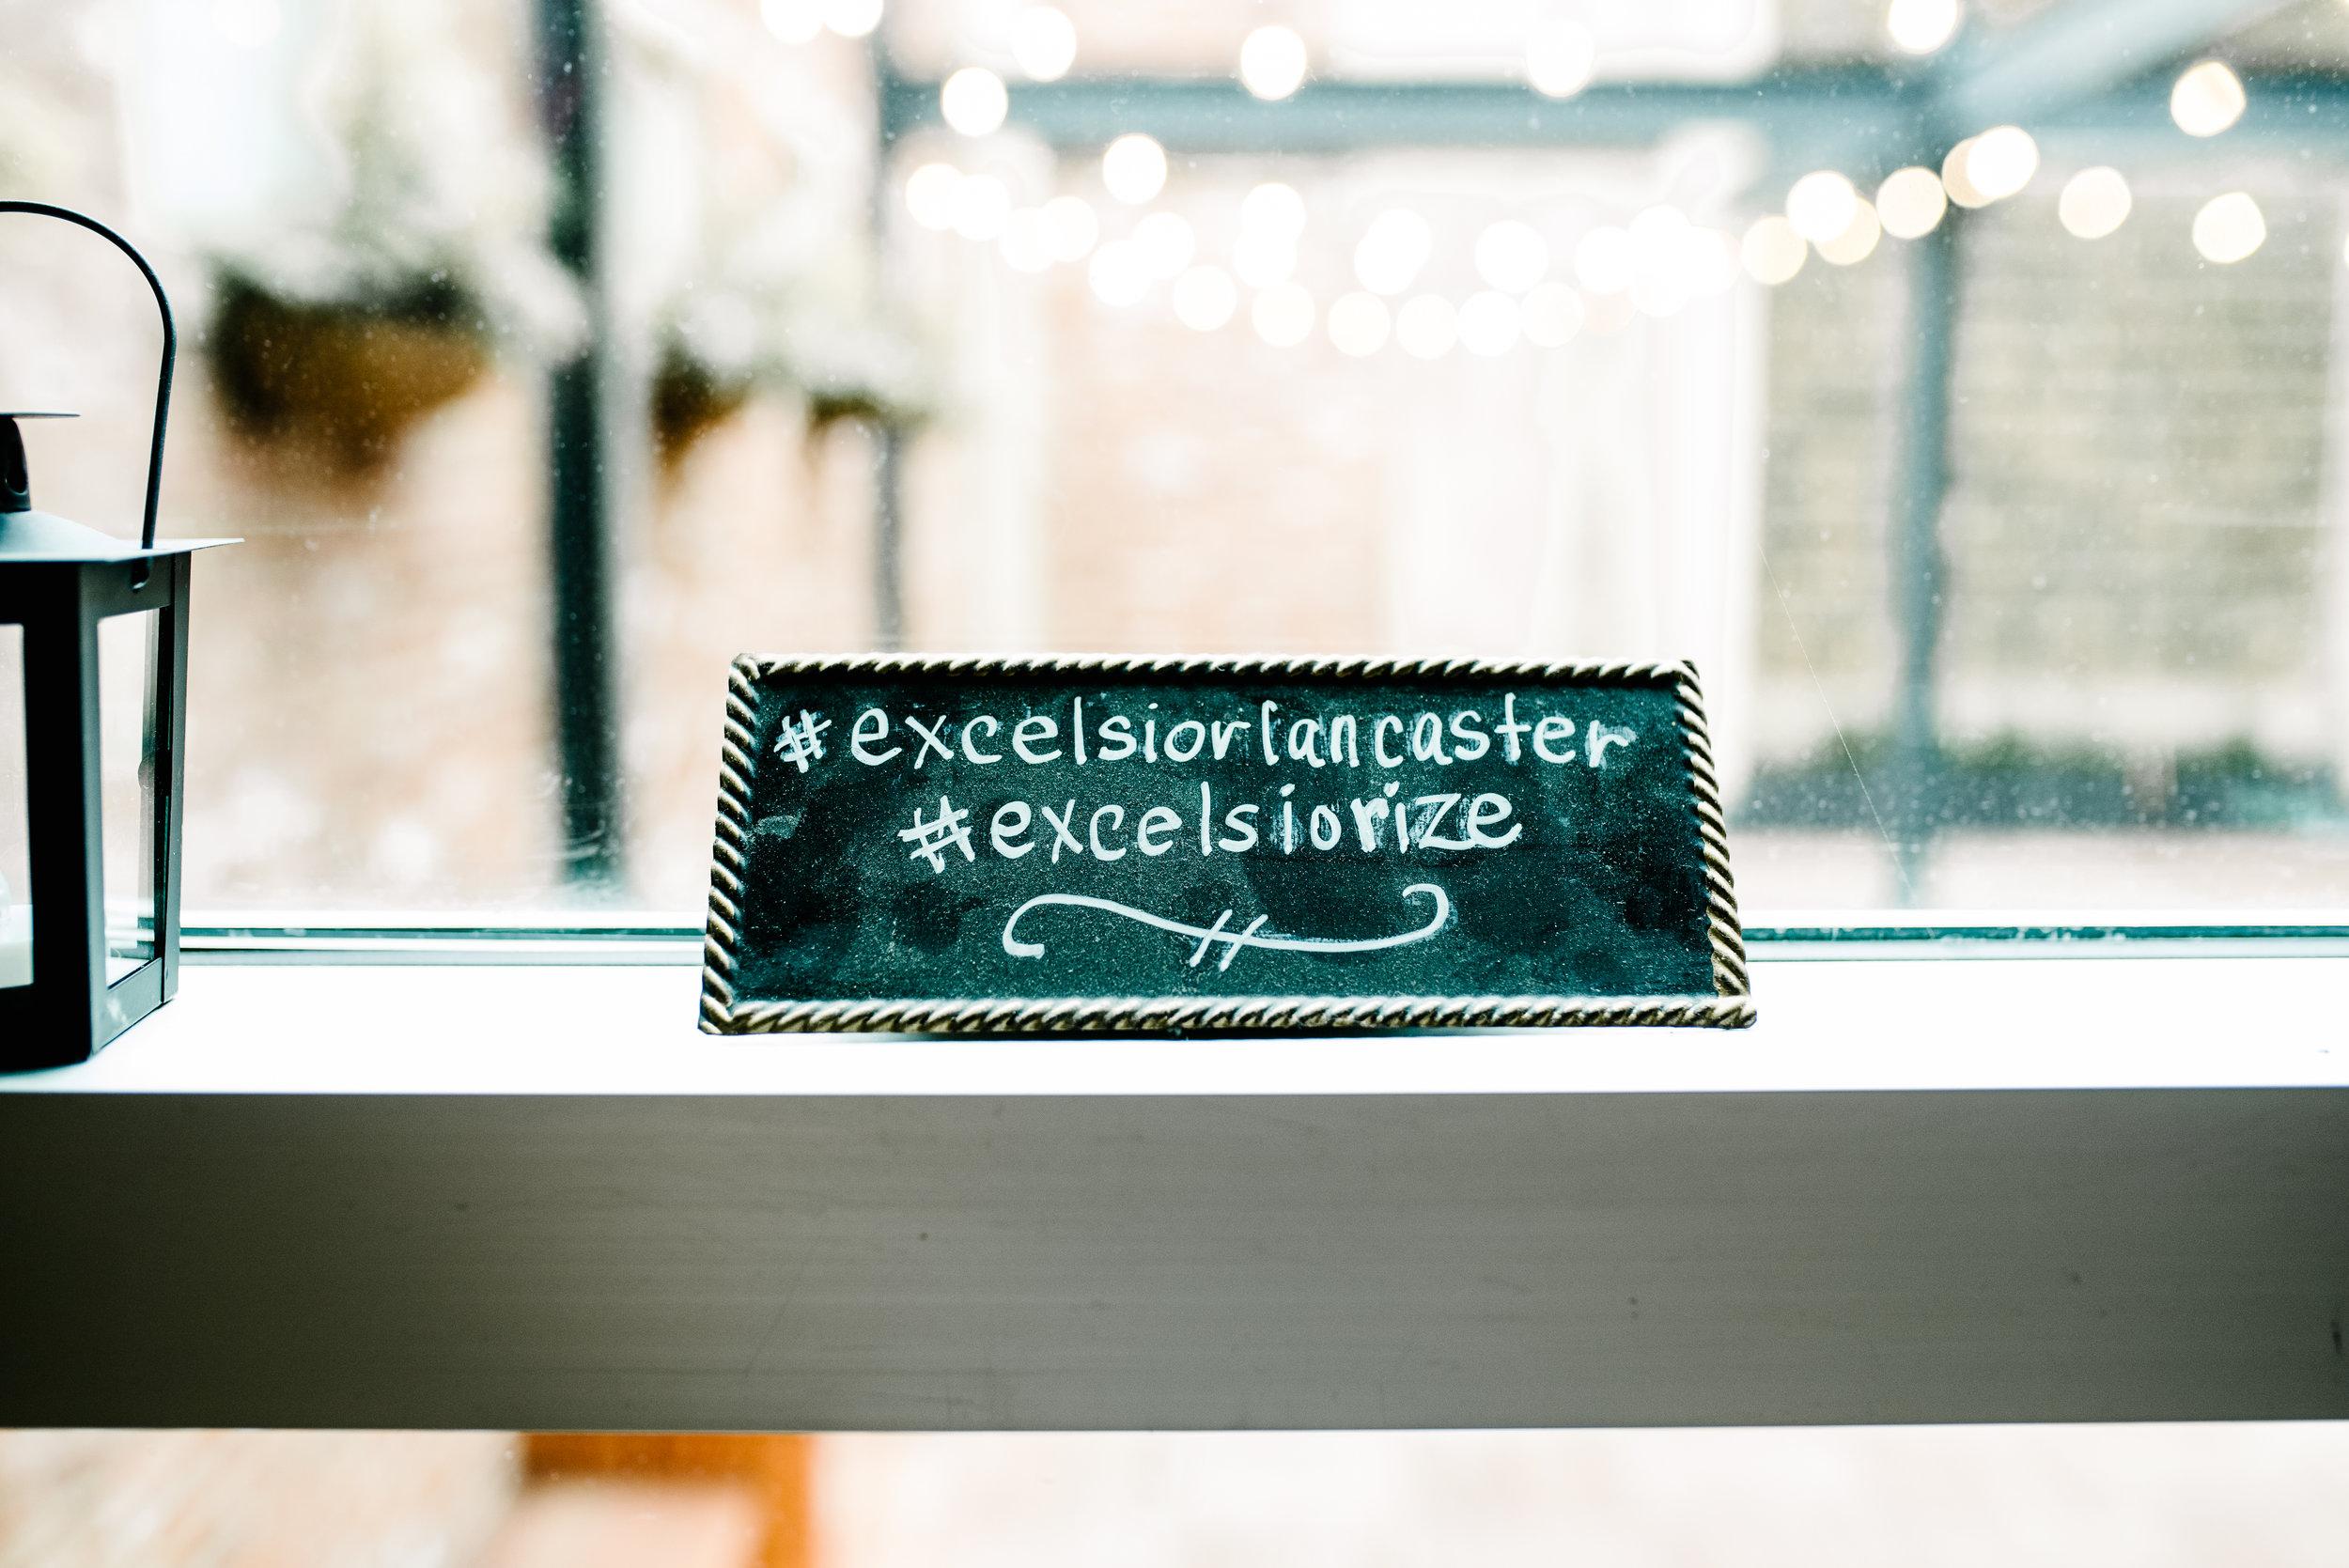 agpcollective_barlettowedding_excelsiorlancaster_ceremony-5271.jpg